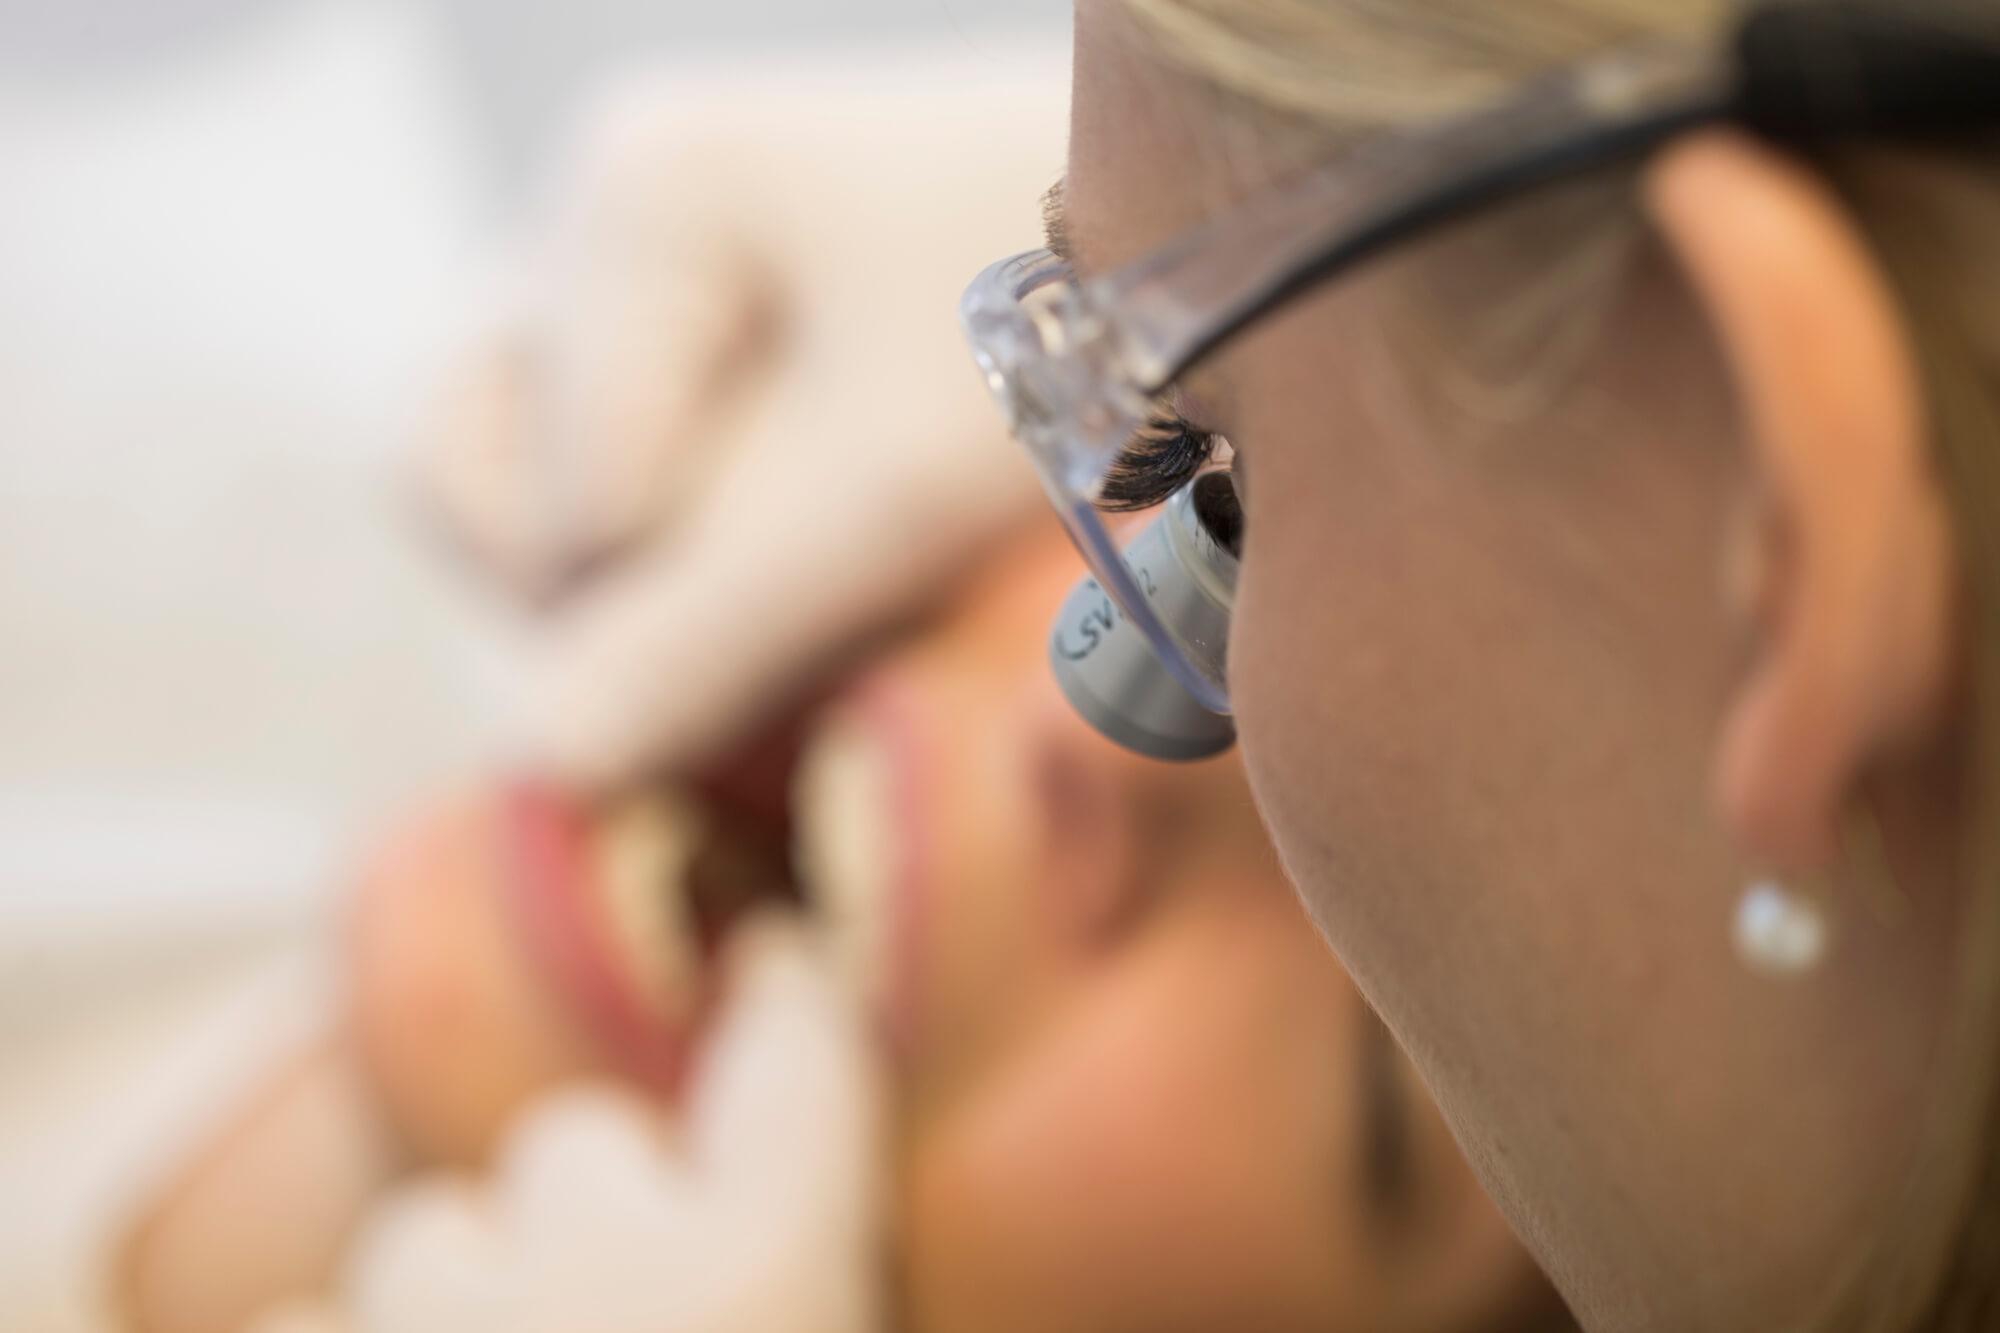 Weiße Ästhetik bedeutet gesunde, glänzende Zähne